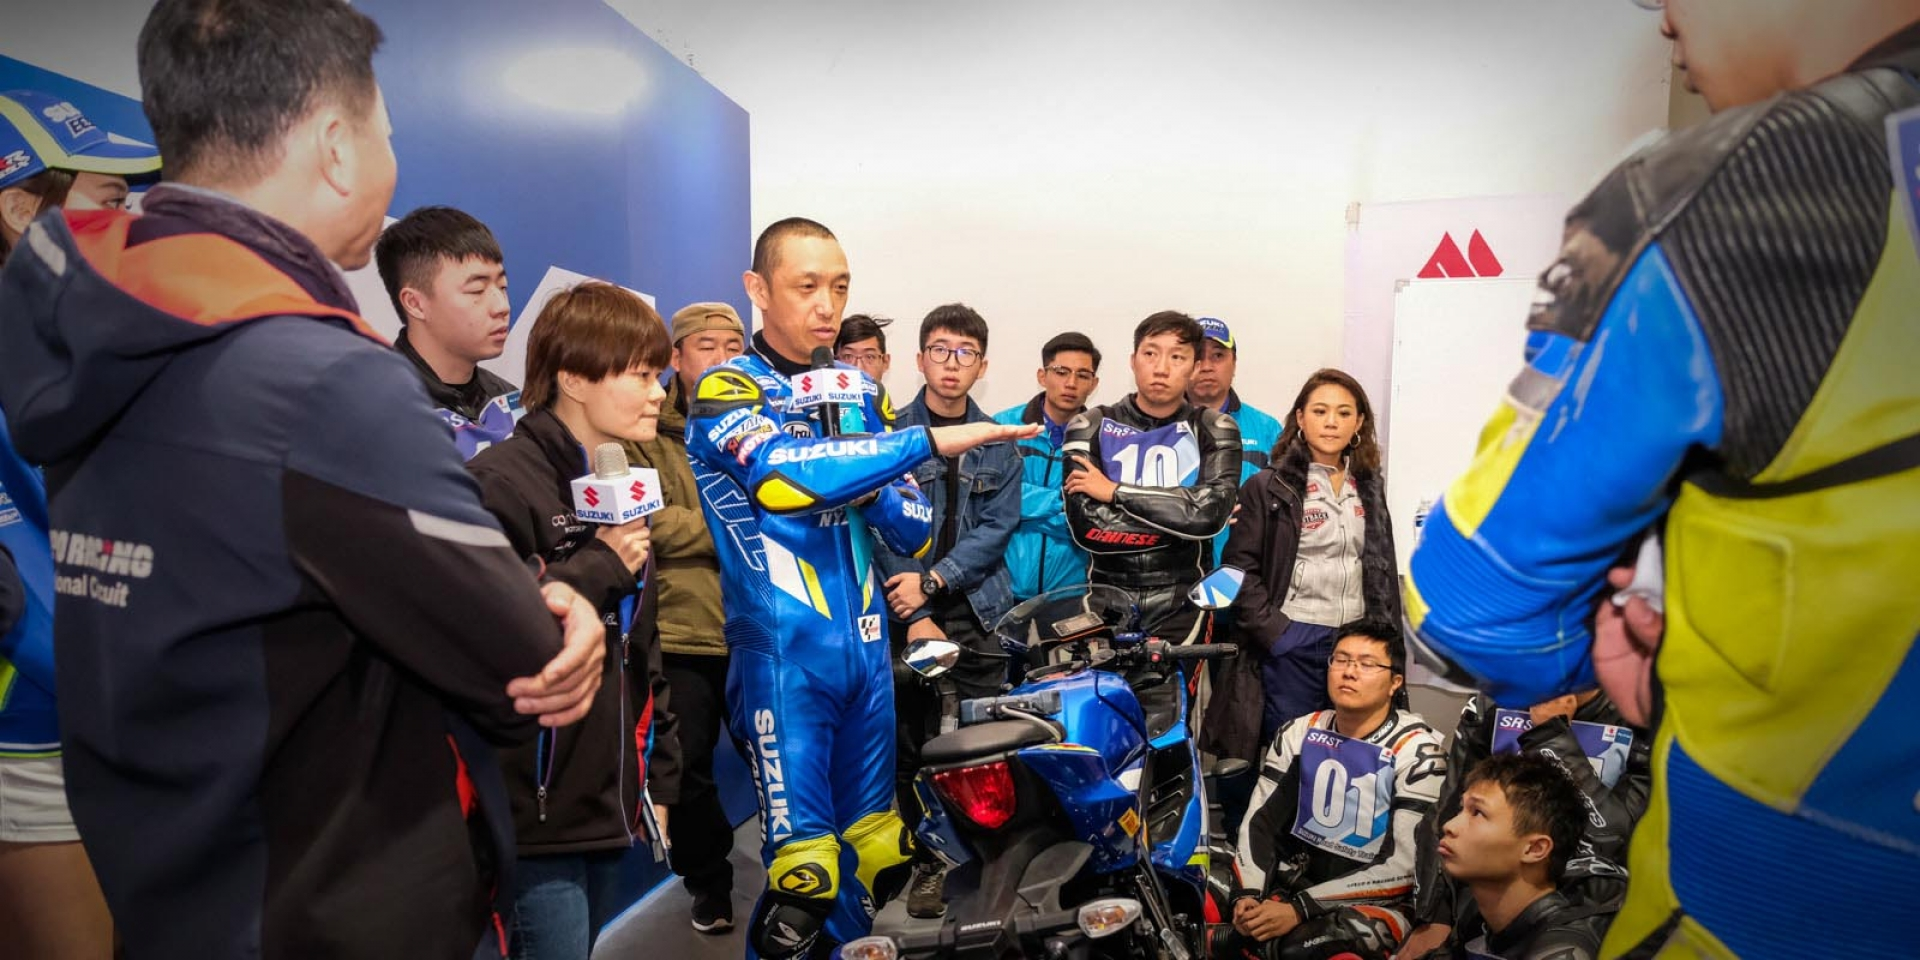 MotoGP等級車手教你騎車!青木宣篤SUZUKI Racing Camp ,細心指導讓你更快